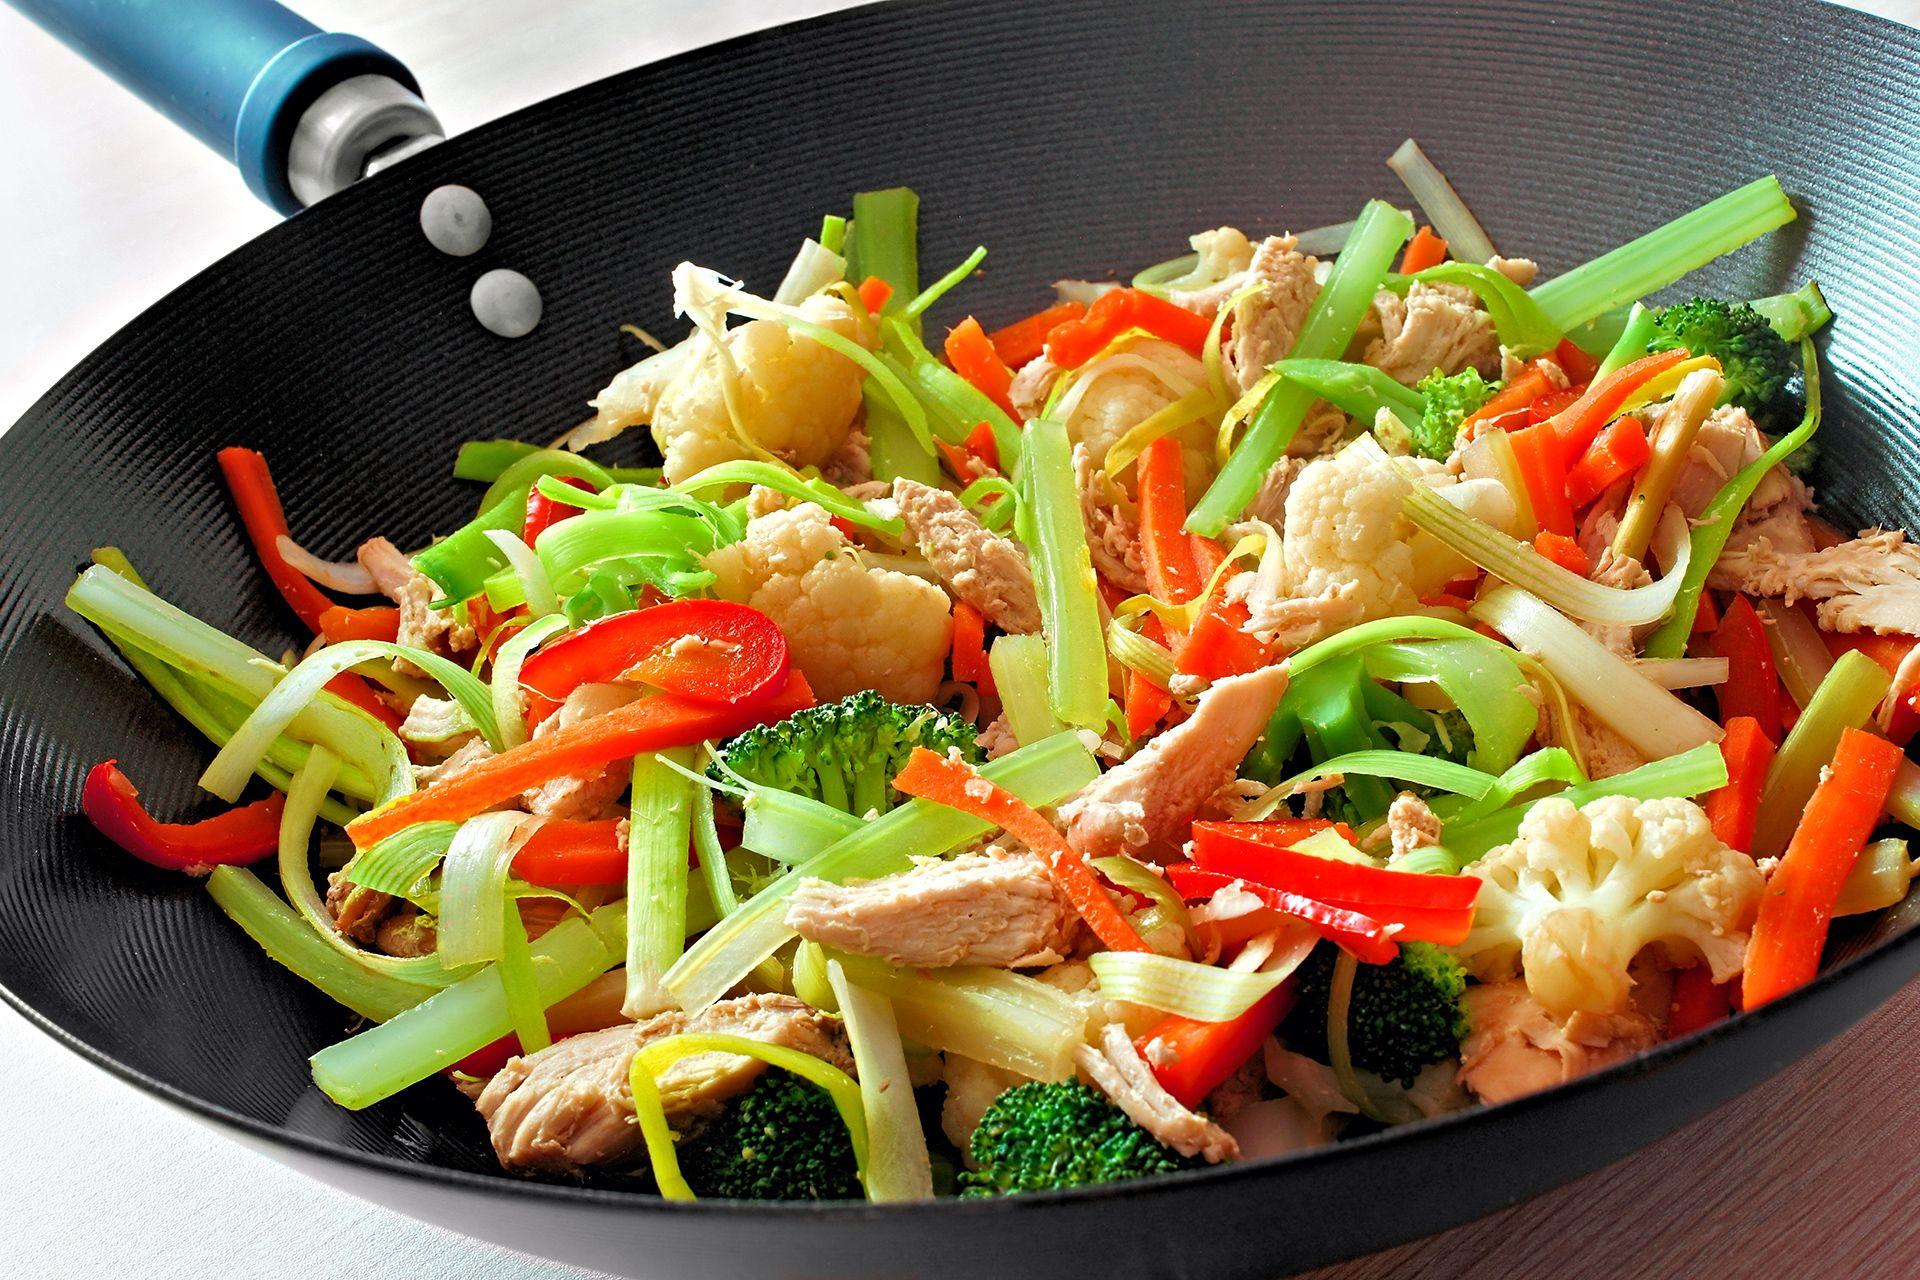 Wok Kochkurs ab 89€ » Leckere Gerichte mit Wok zaubern